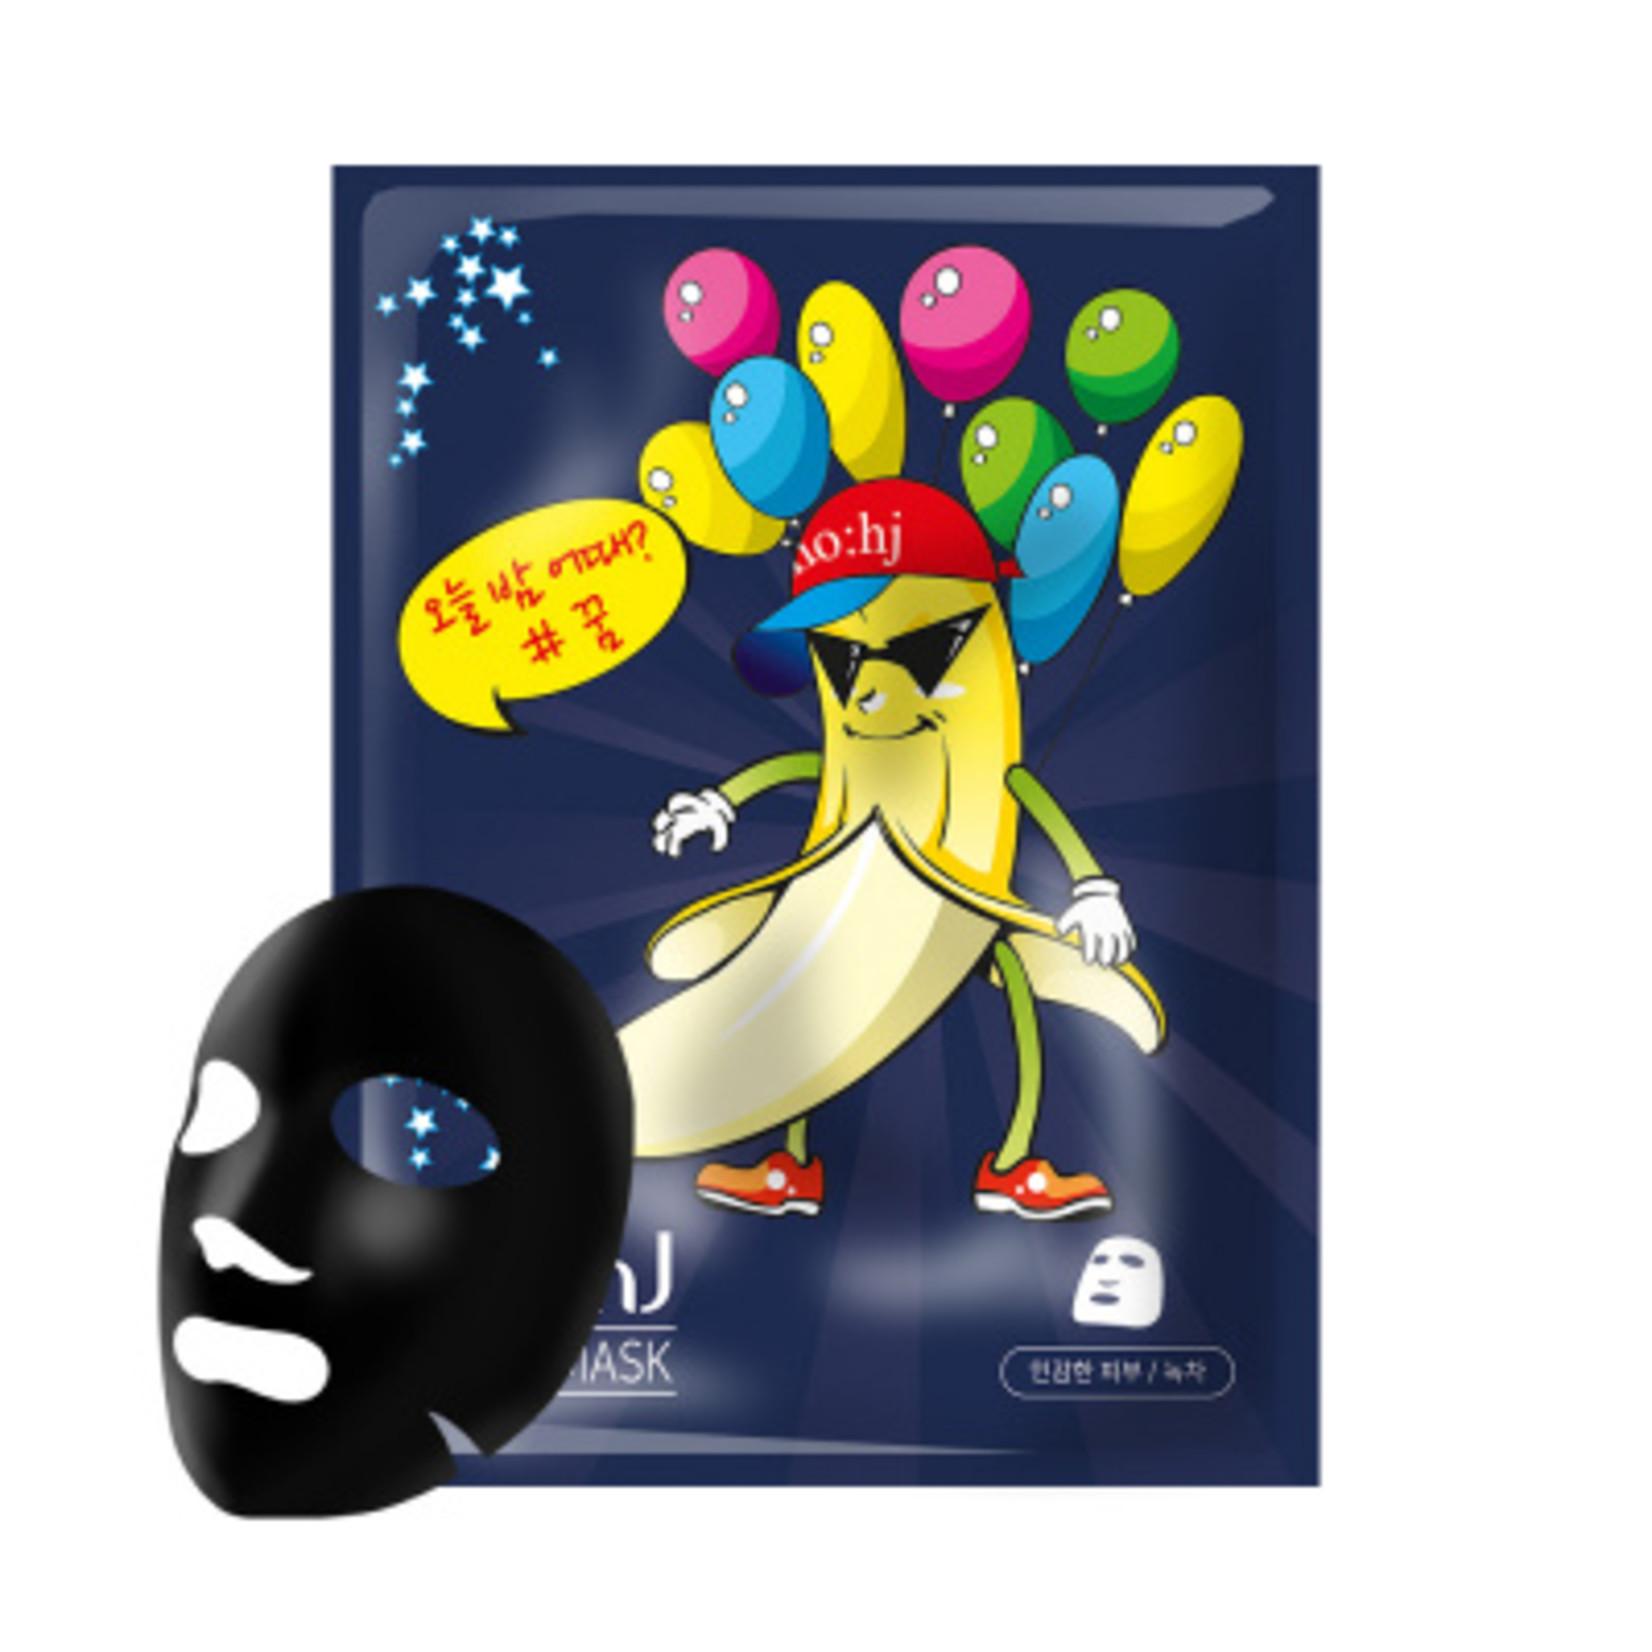 nohj Banana SSUL Maskpack [Green tea]